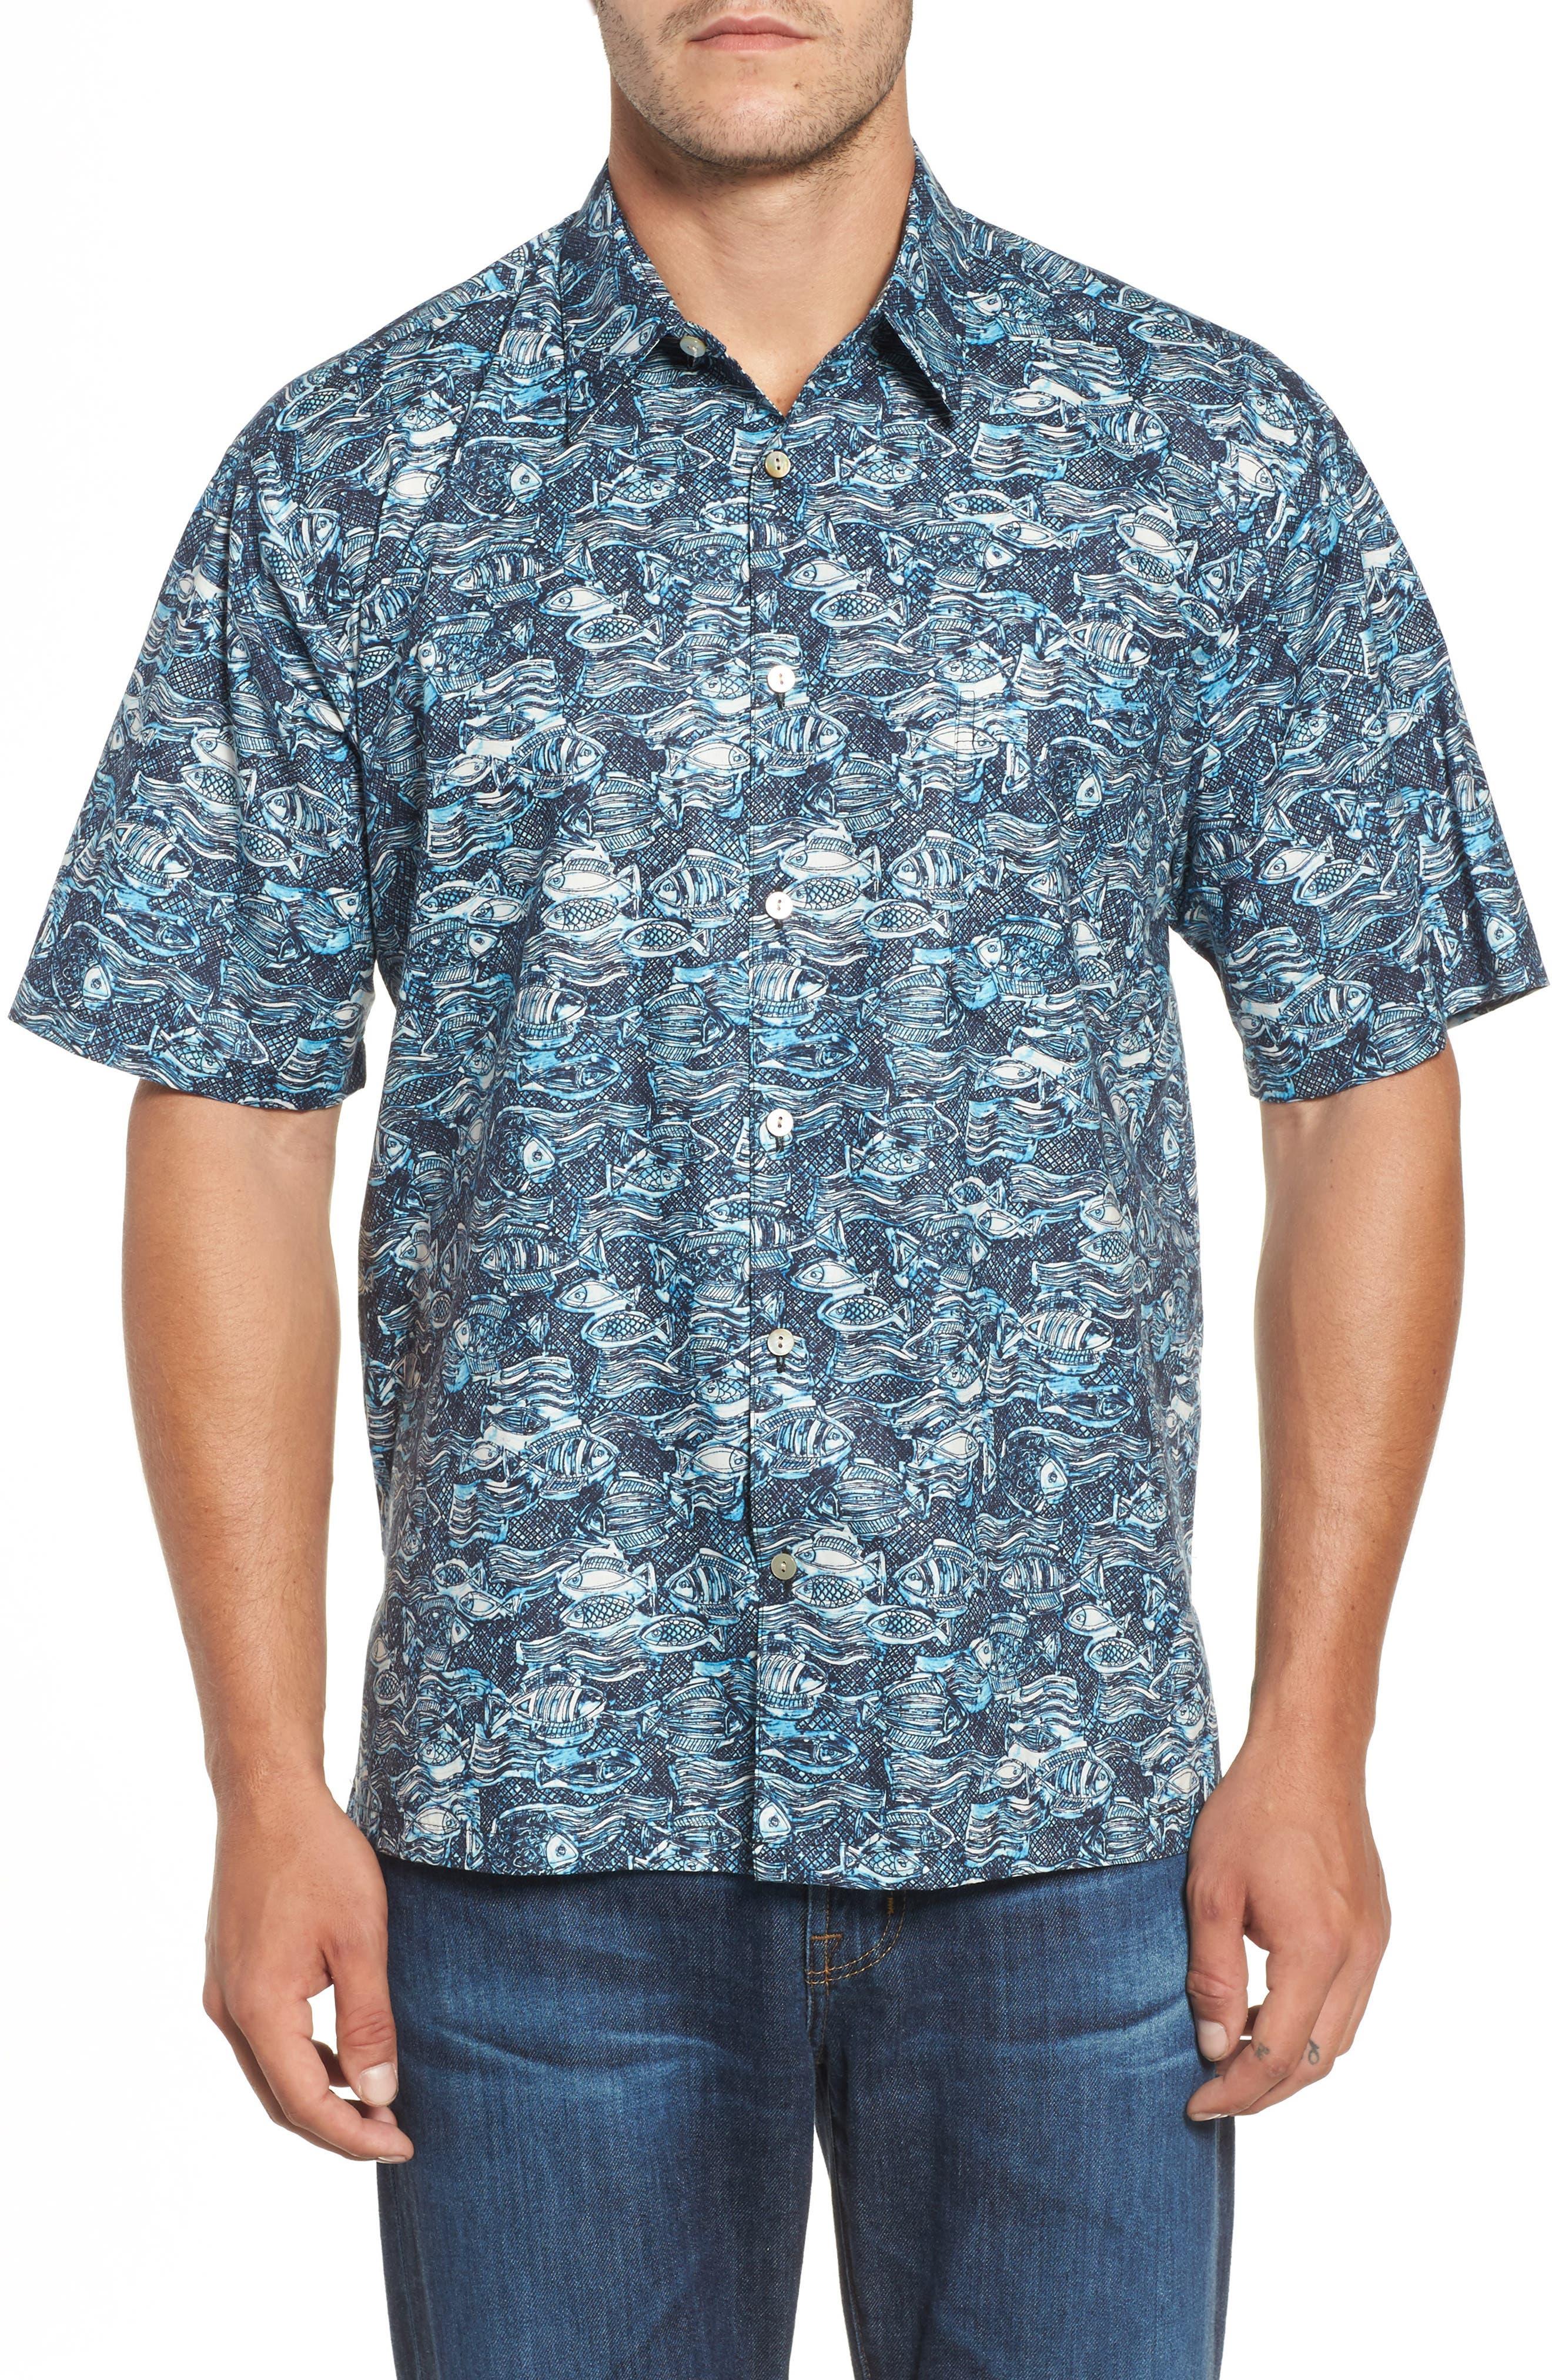 Tori Richard Pike Place Classic Fit Camp Shirt